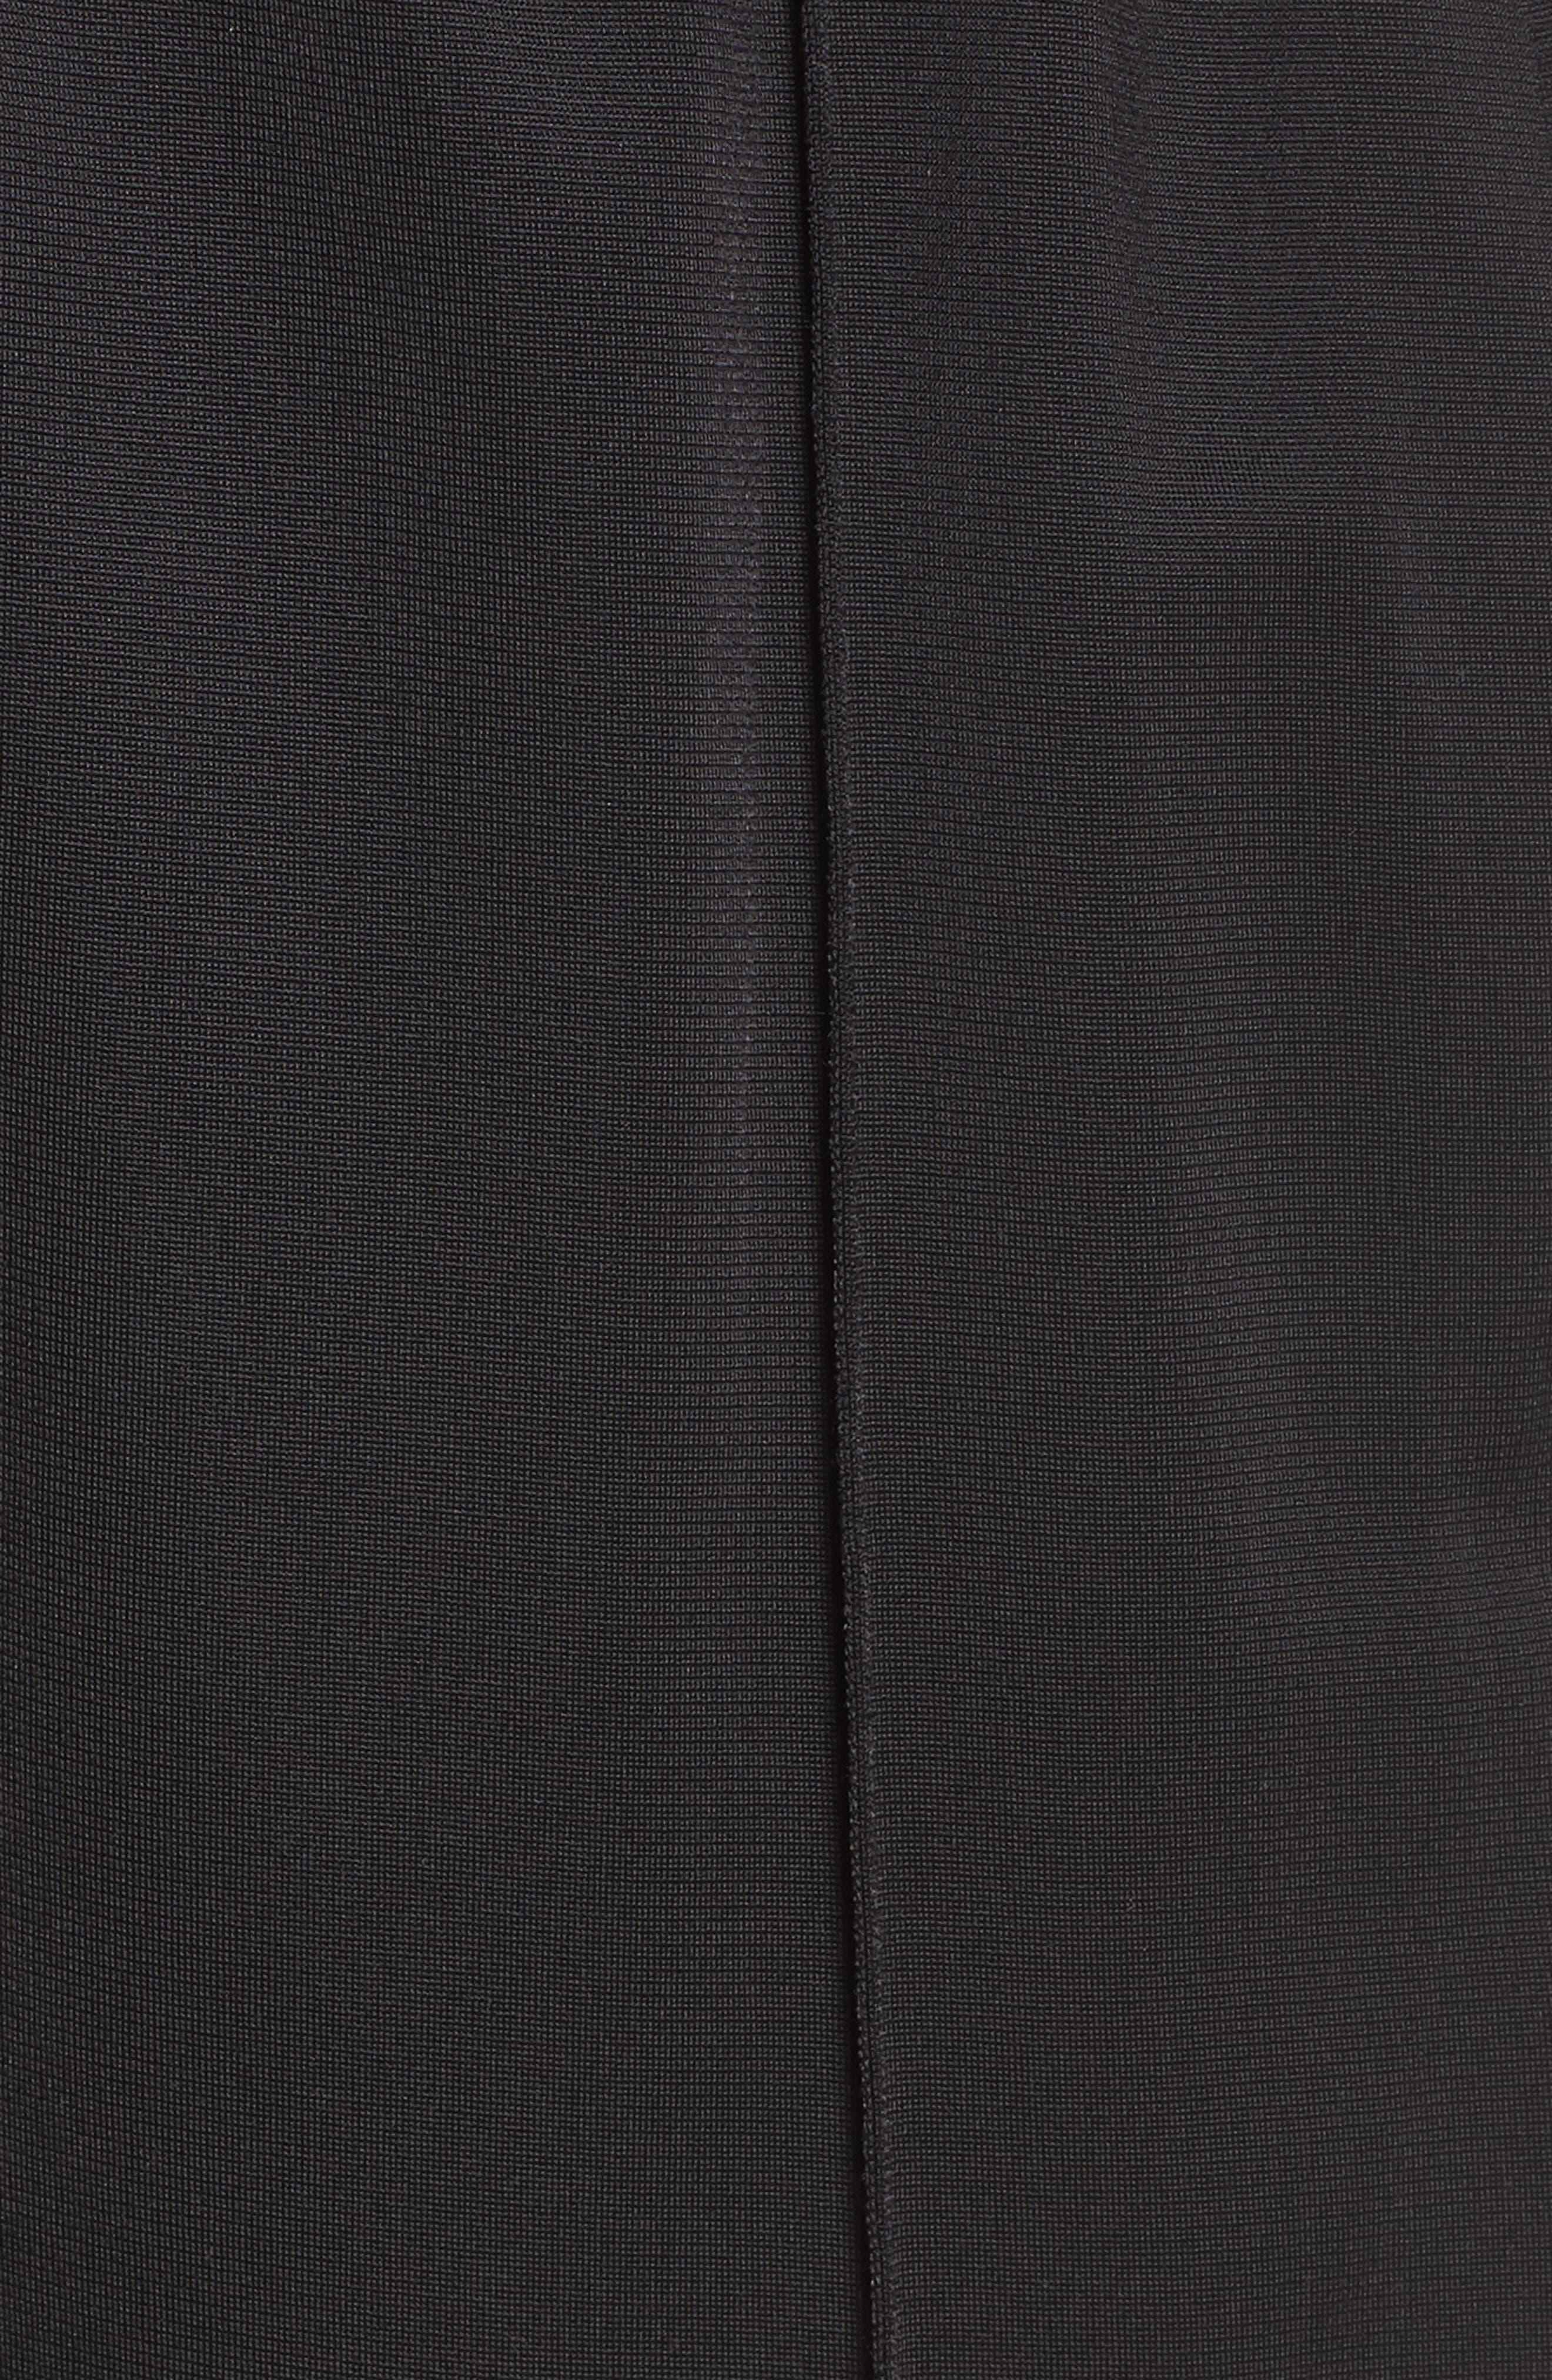 Adibreak Tearaway Track Pants,                             Alternate thumbnail 6, color,                             BLACK/ CARBON